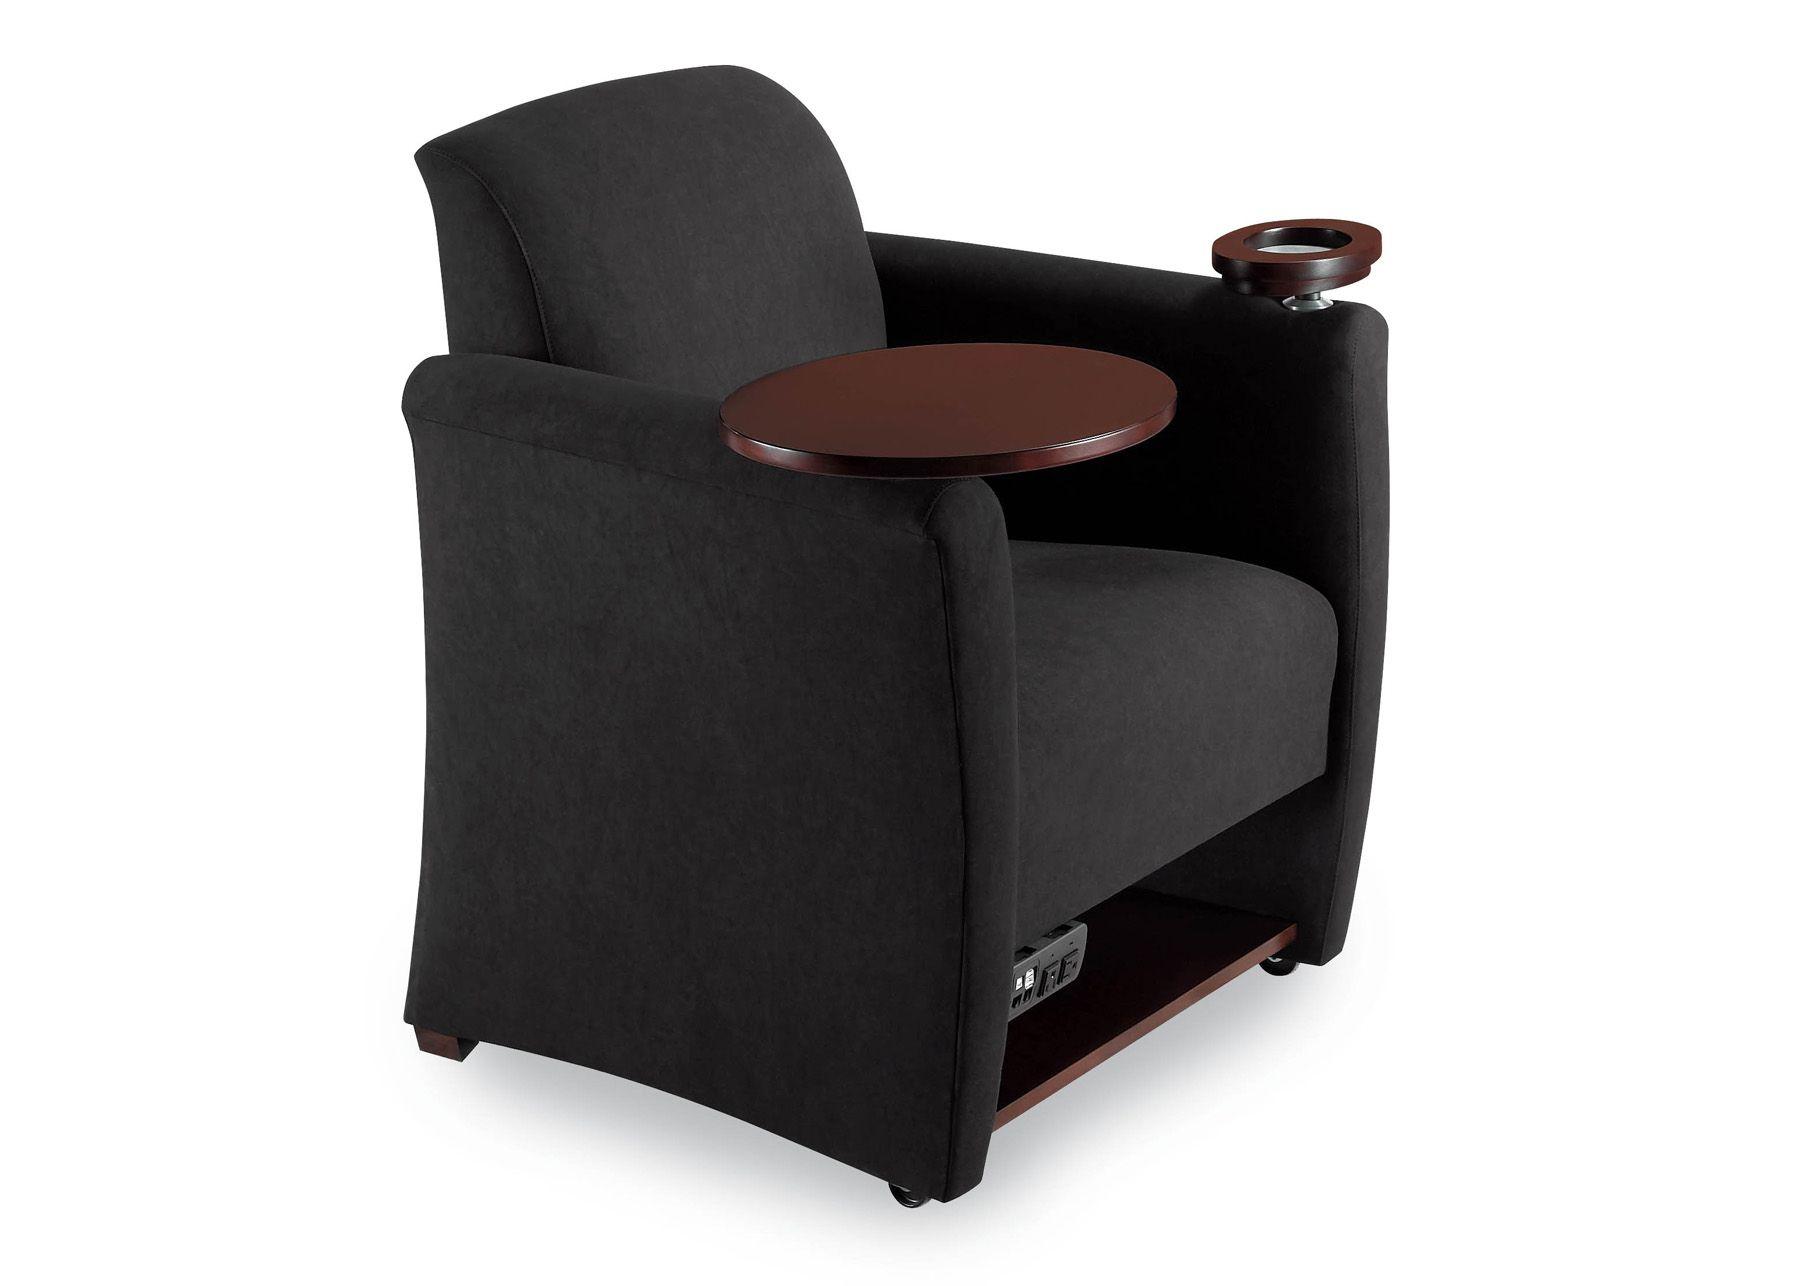 Cabot Wrenn Fine Furniture